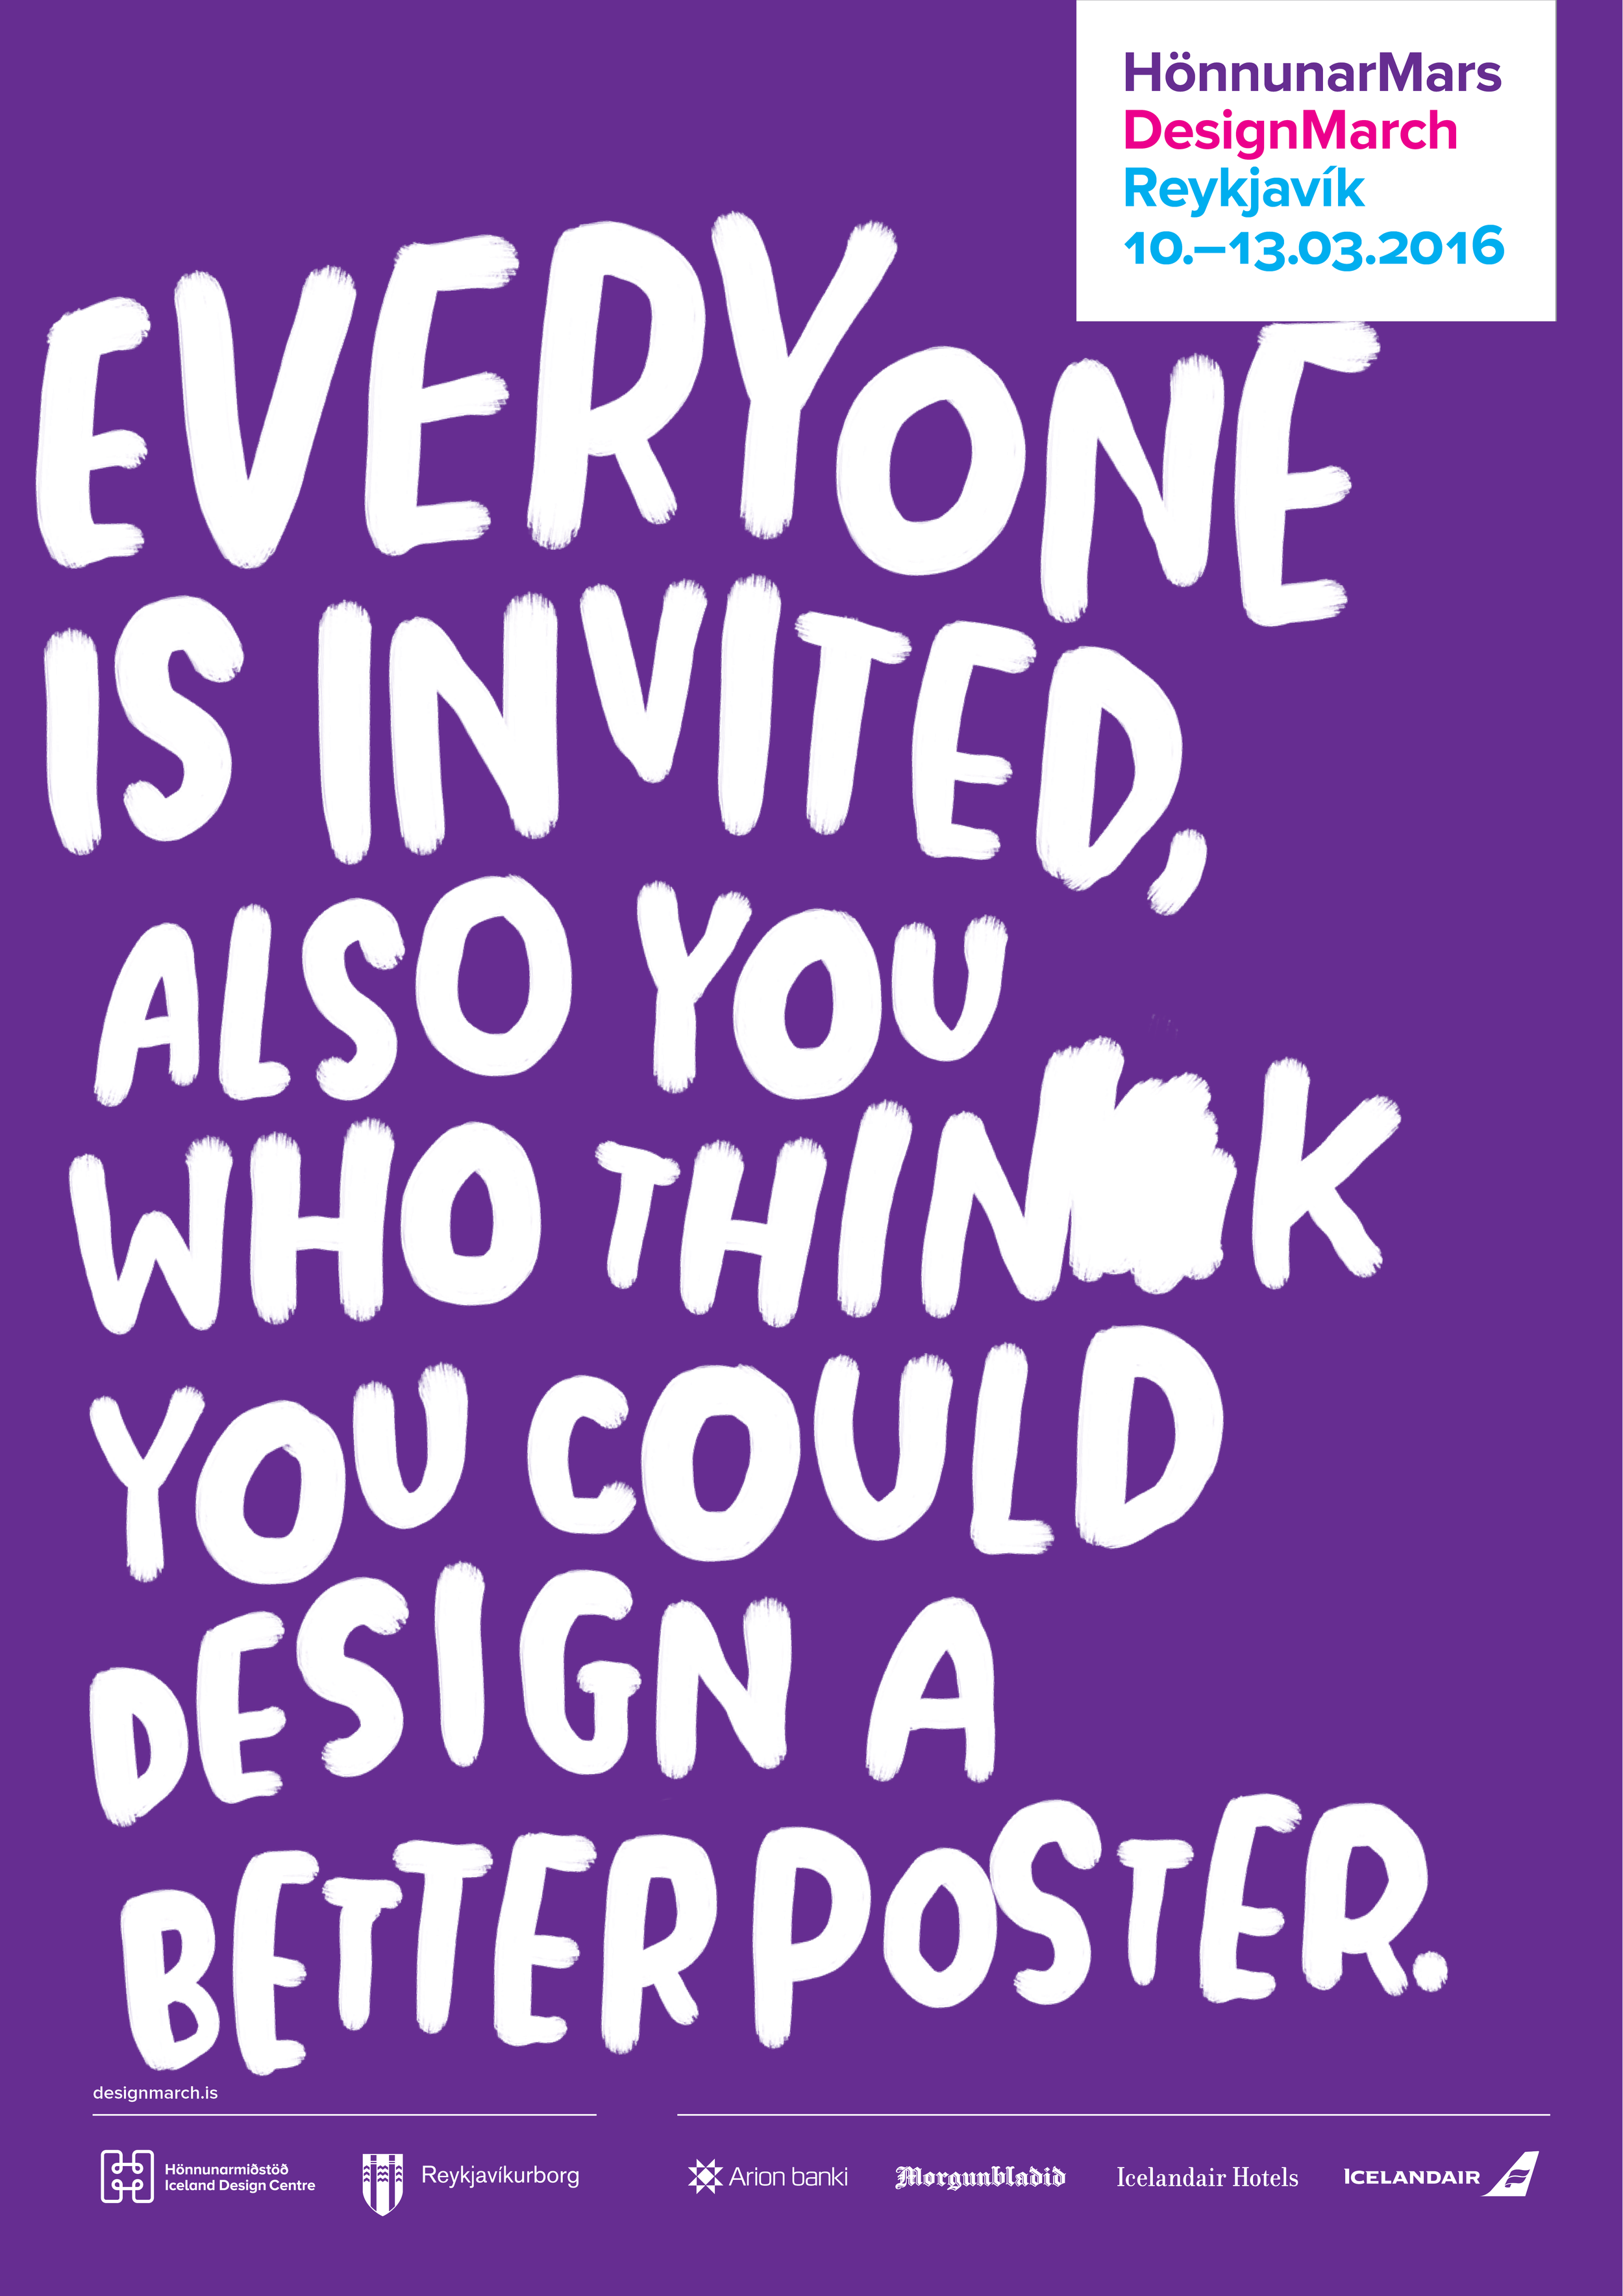 Design+a+March+brand+identity+ +tomasdottir.+ +logo+design,+pattern+design,+online+marketing,+festival+design,+branding,+illustration,+modern,+poster+design